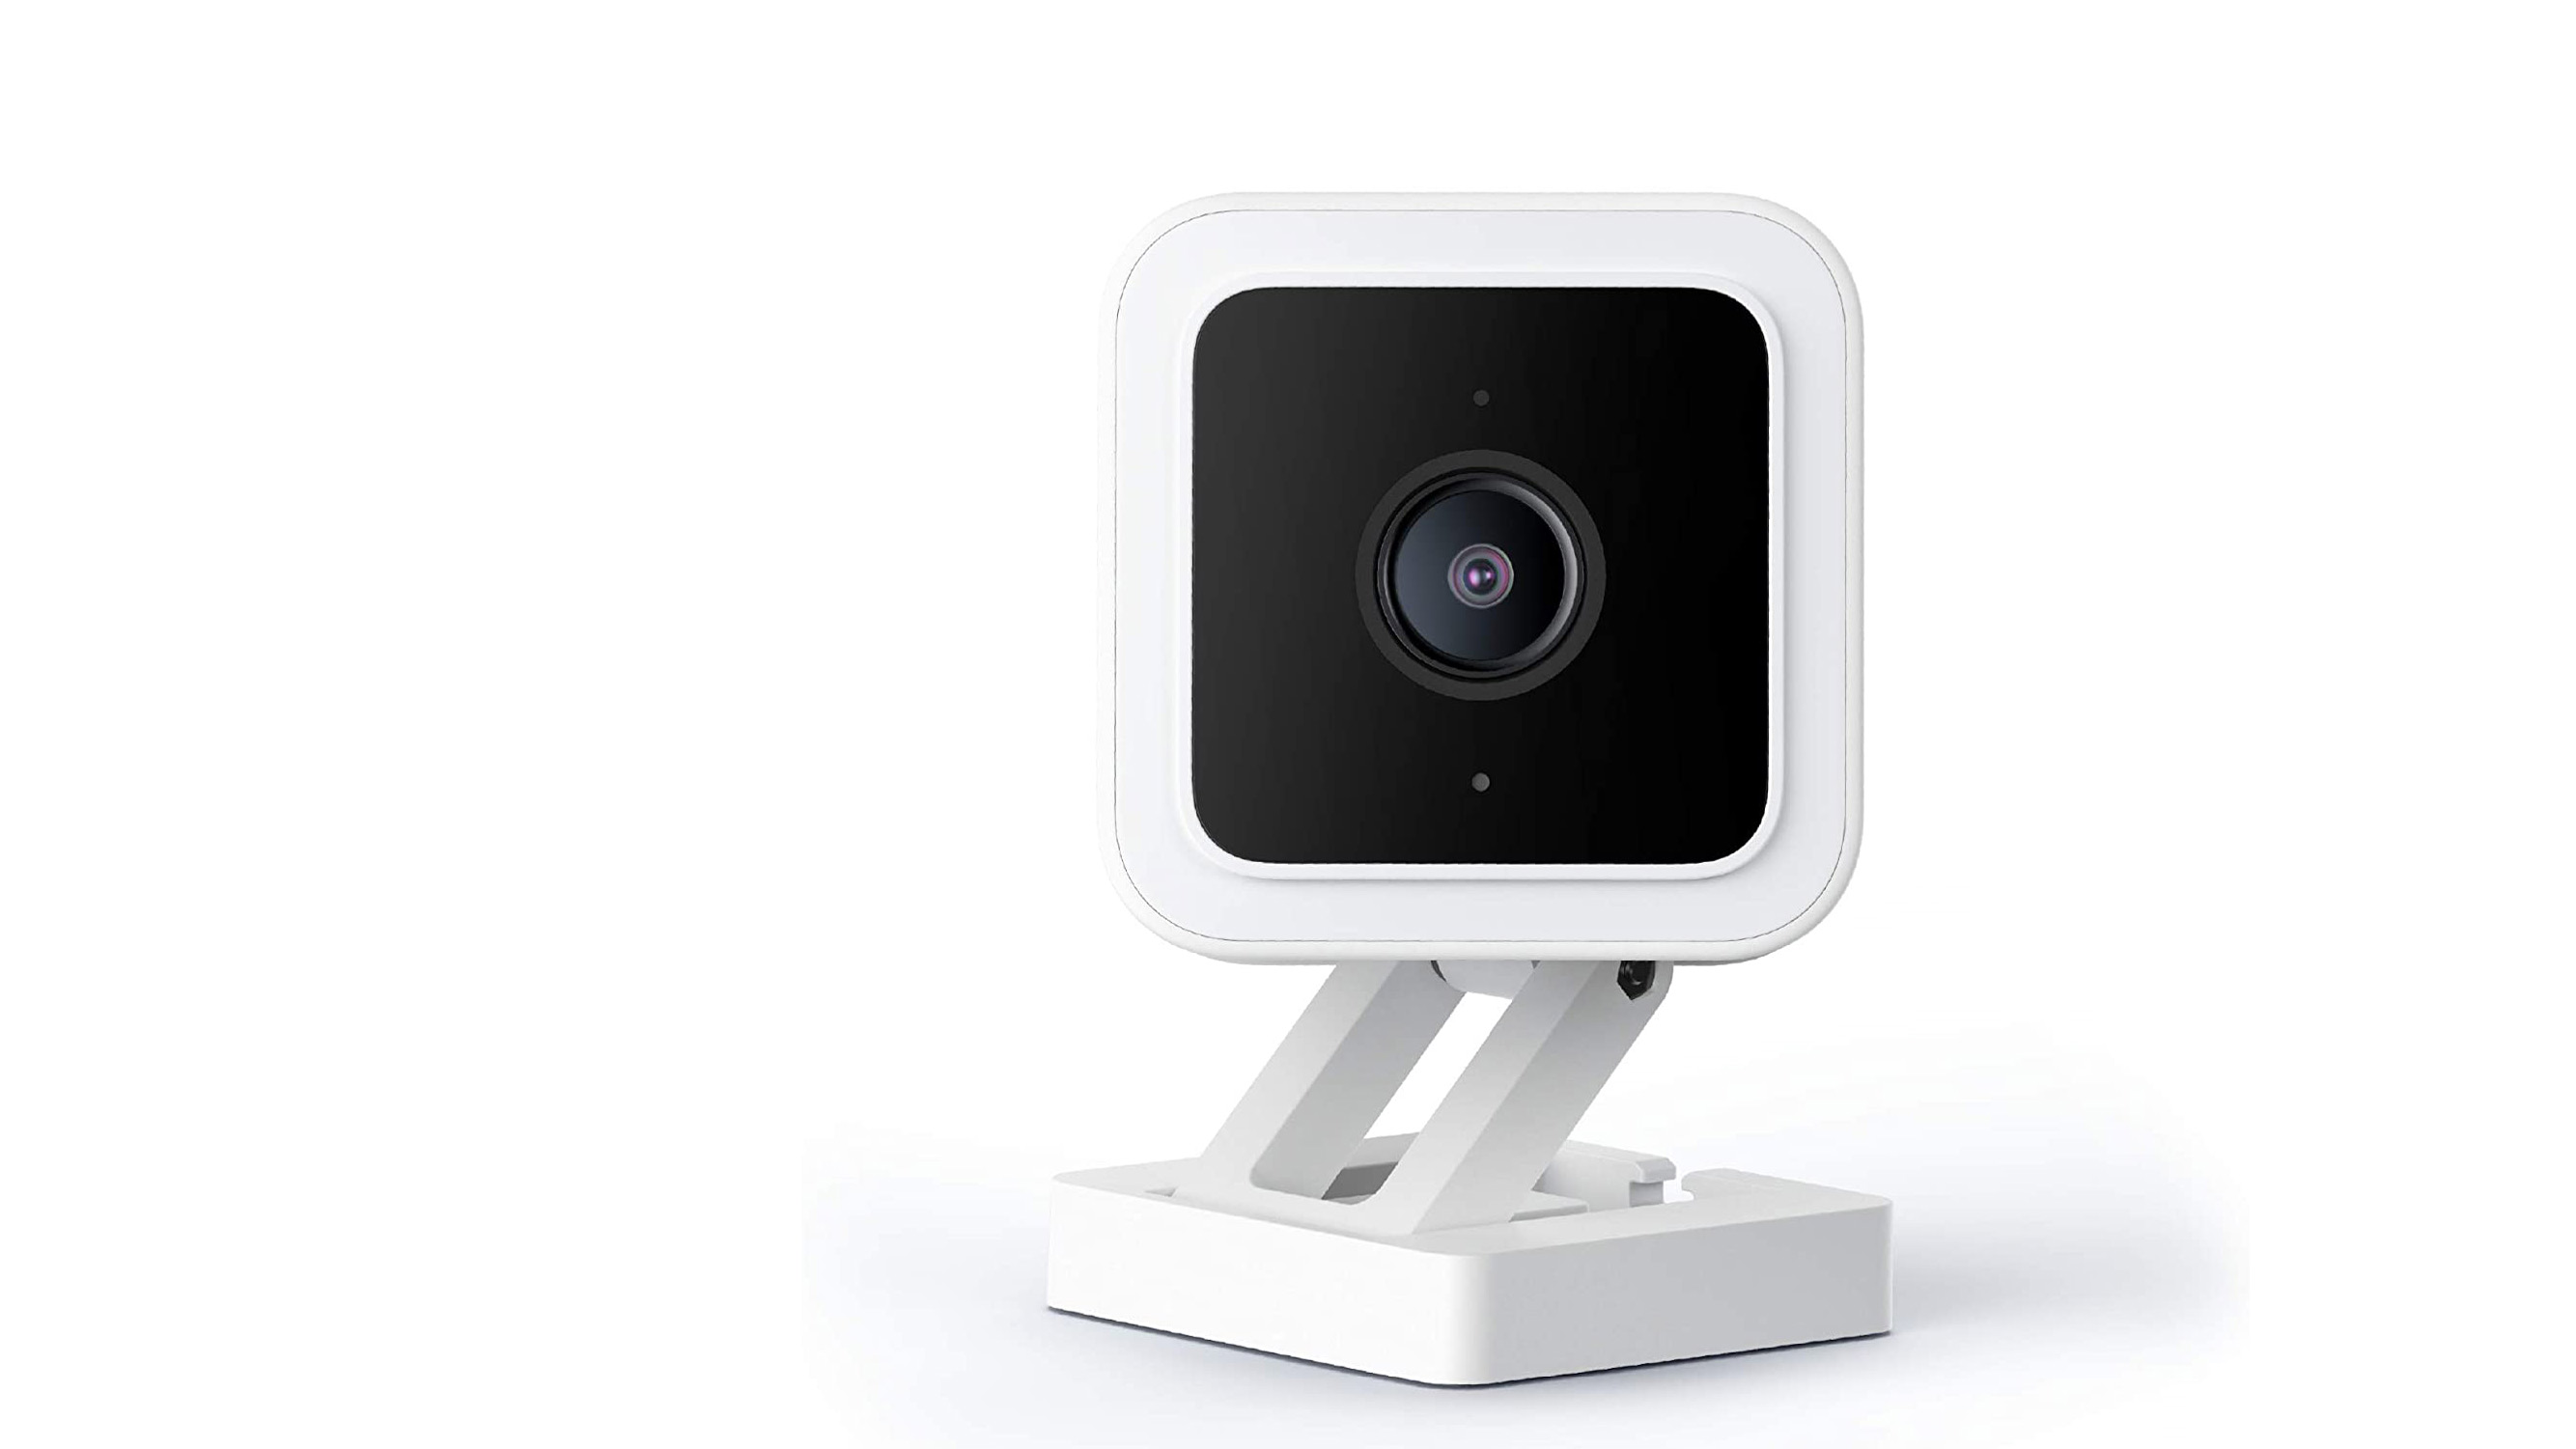 The Wyze Cam V3 on a white background